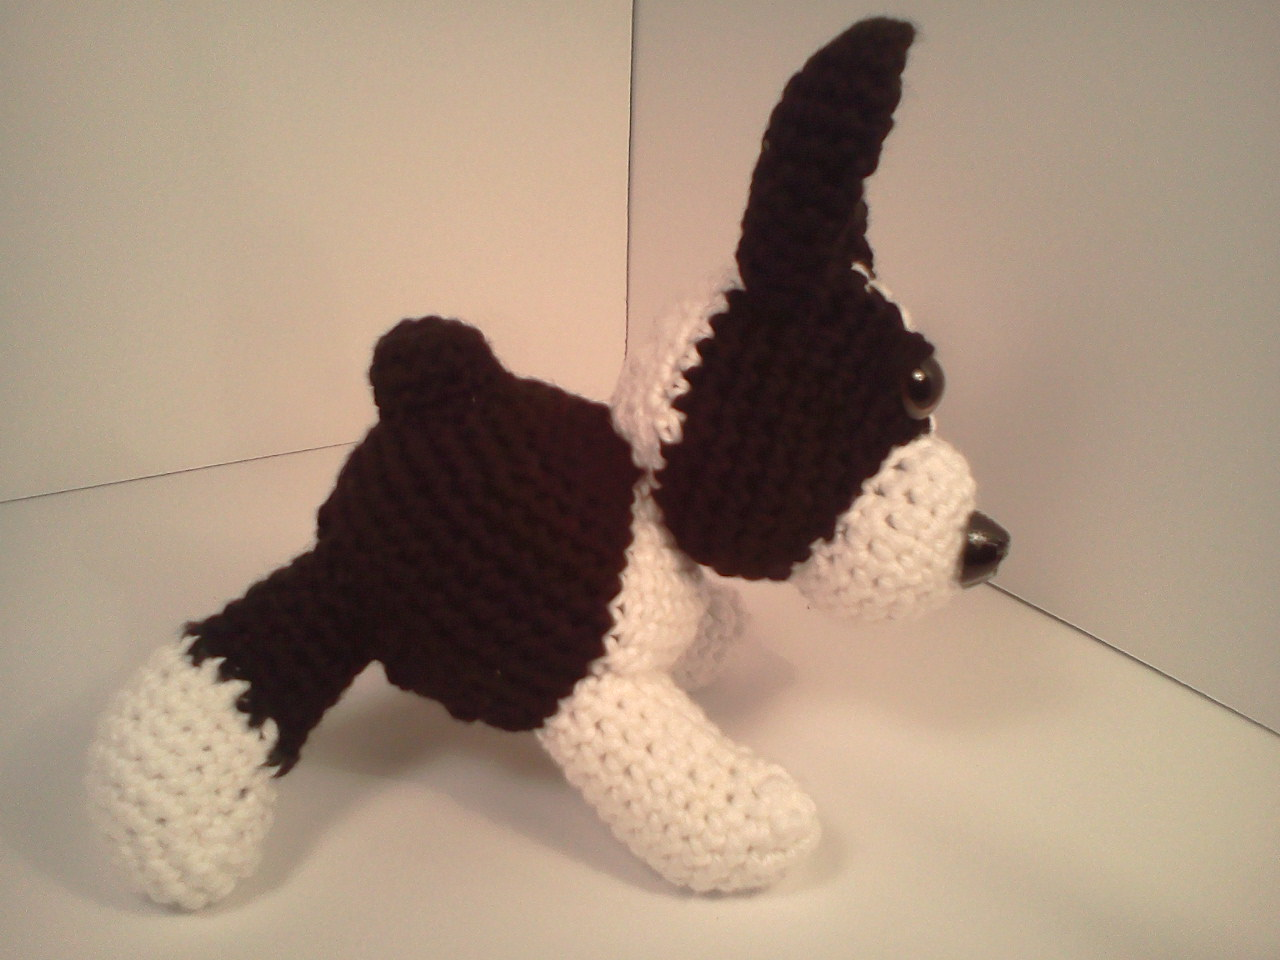 Boston Terrier Amigurumi Dog Crochet Pattern Planetjune ...